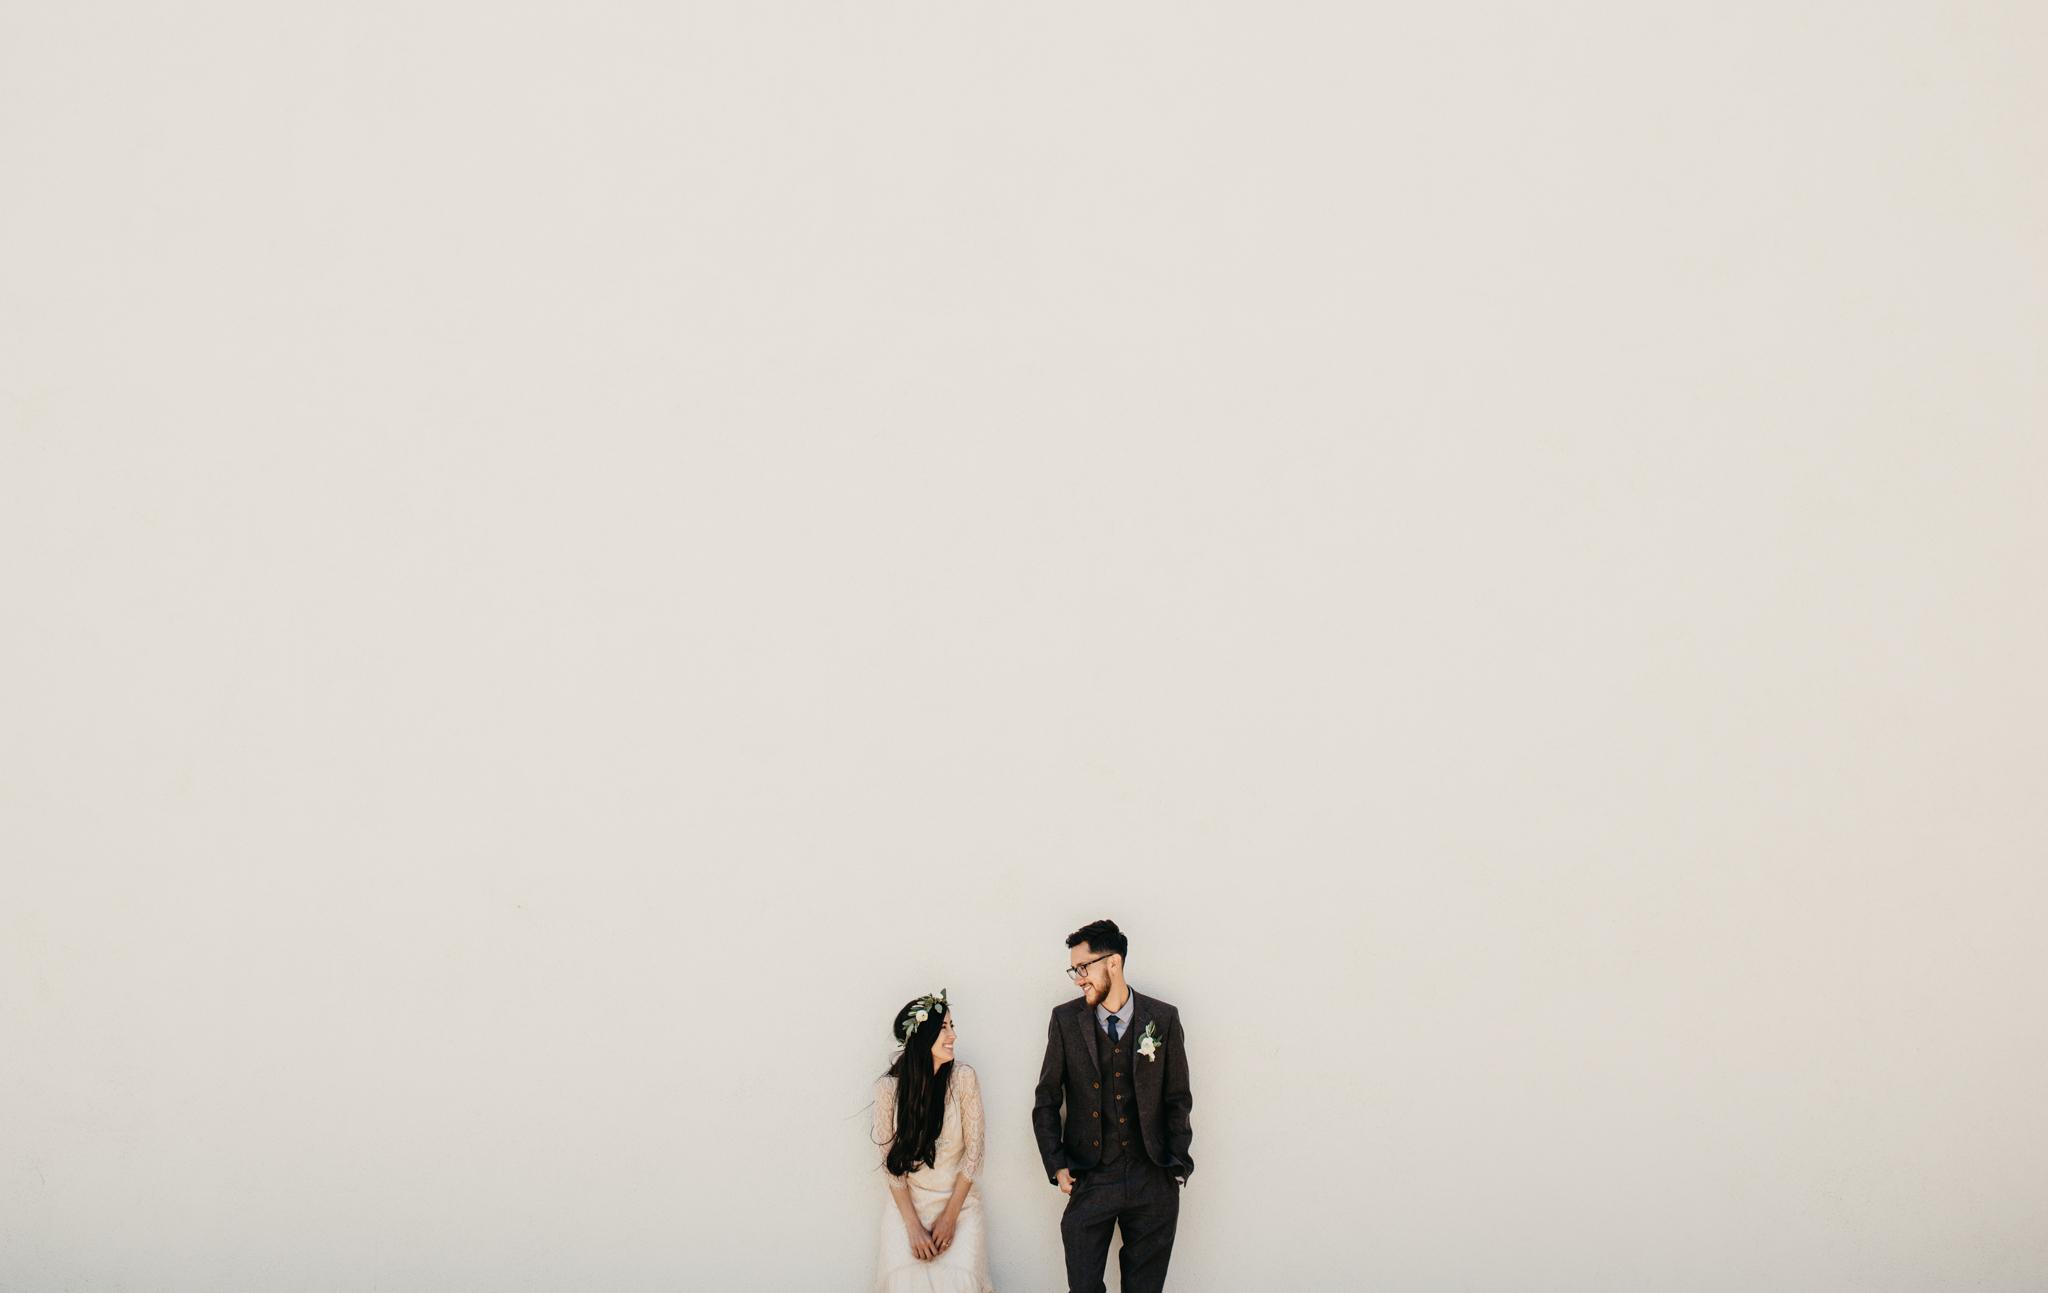 ©Isaiah-&-Taylor-Photography---Oak-Canyon-Nature-Center-Wedding,-Anaheim-Hills-071.jpg